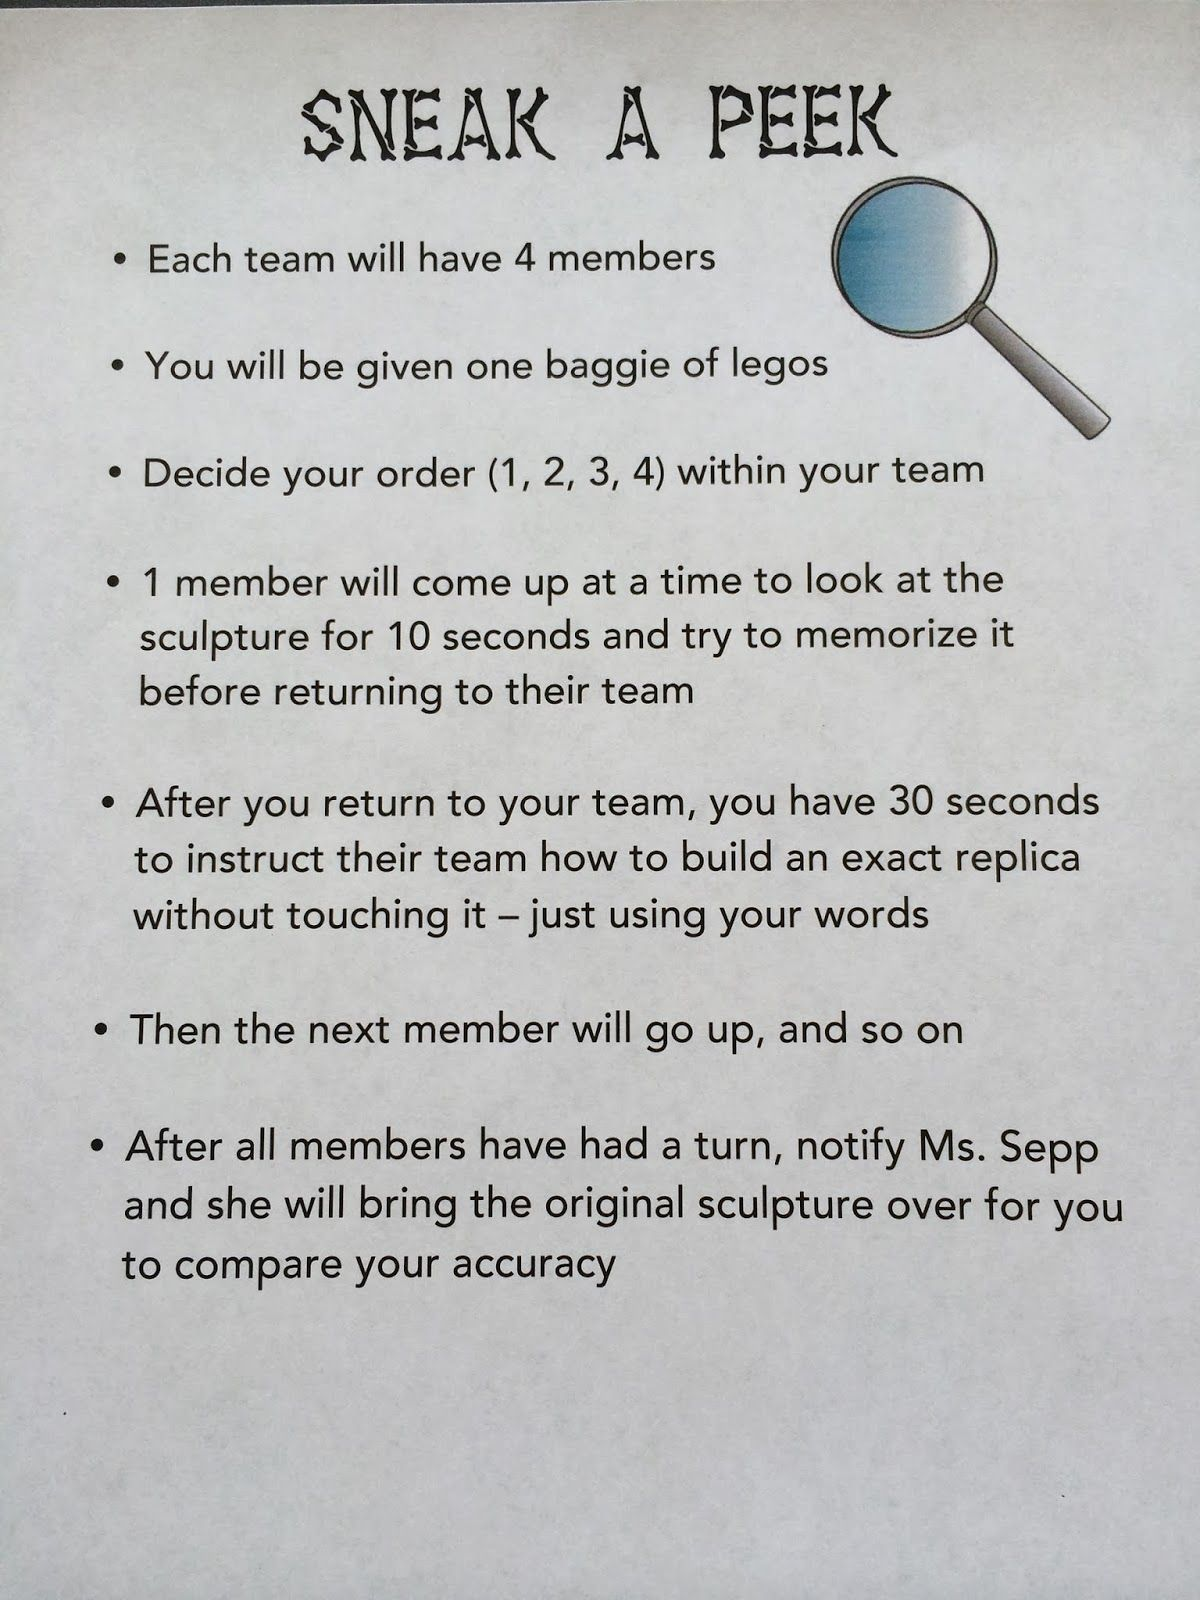 Team Building Sneak A Peek